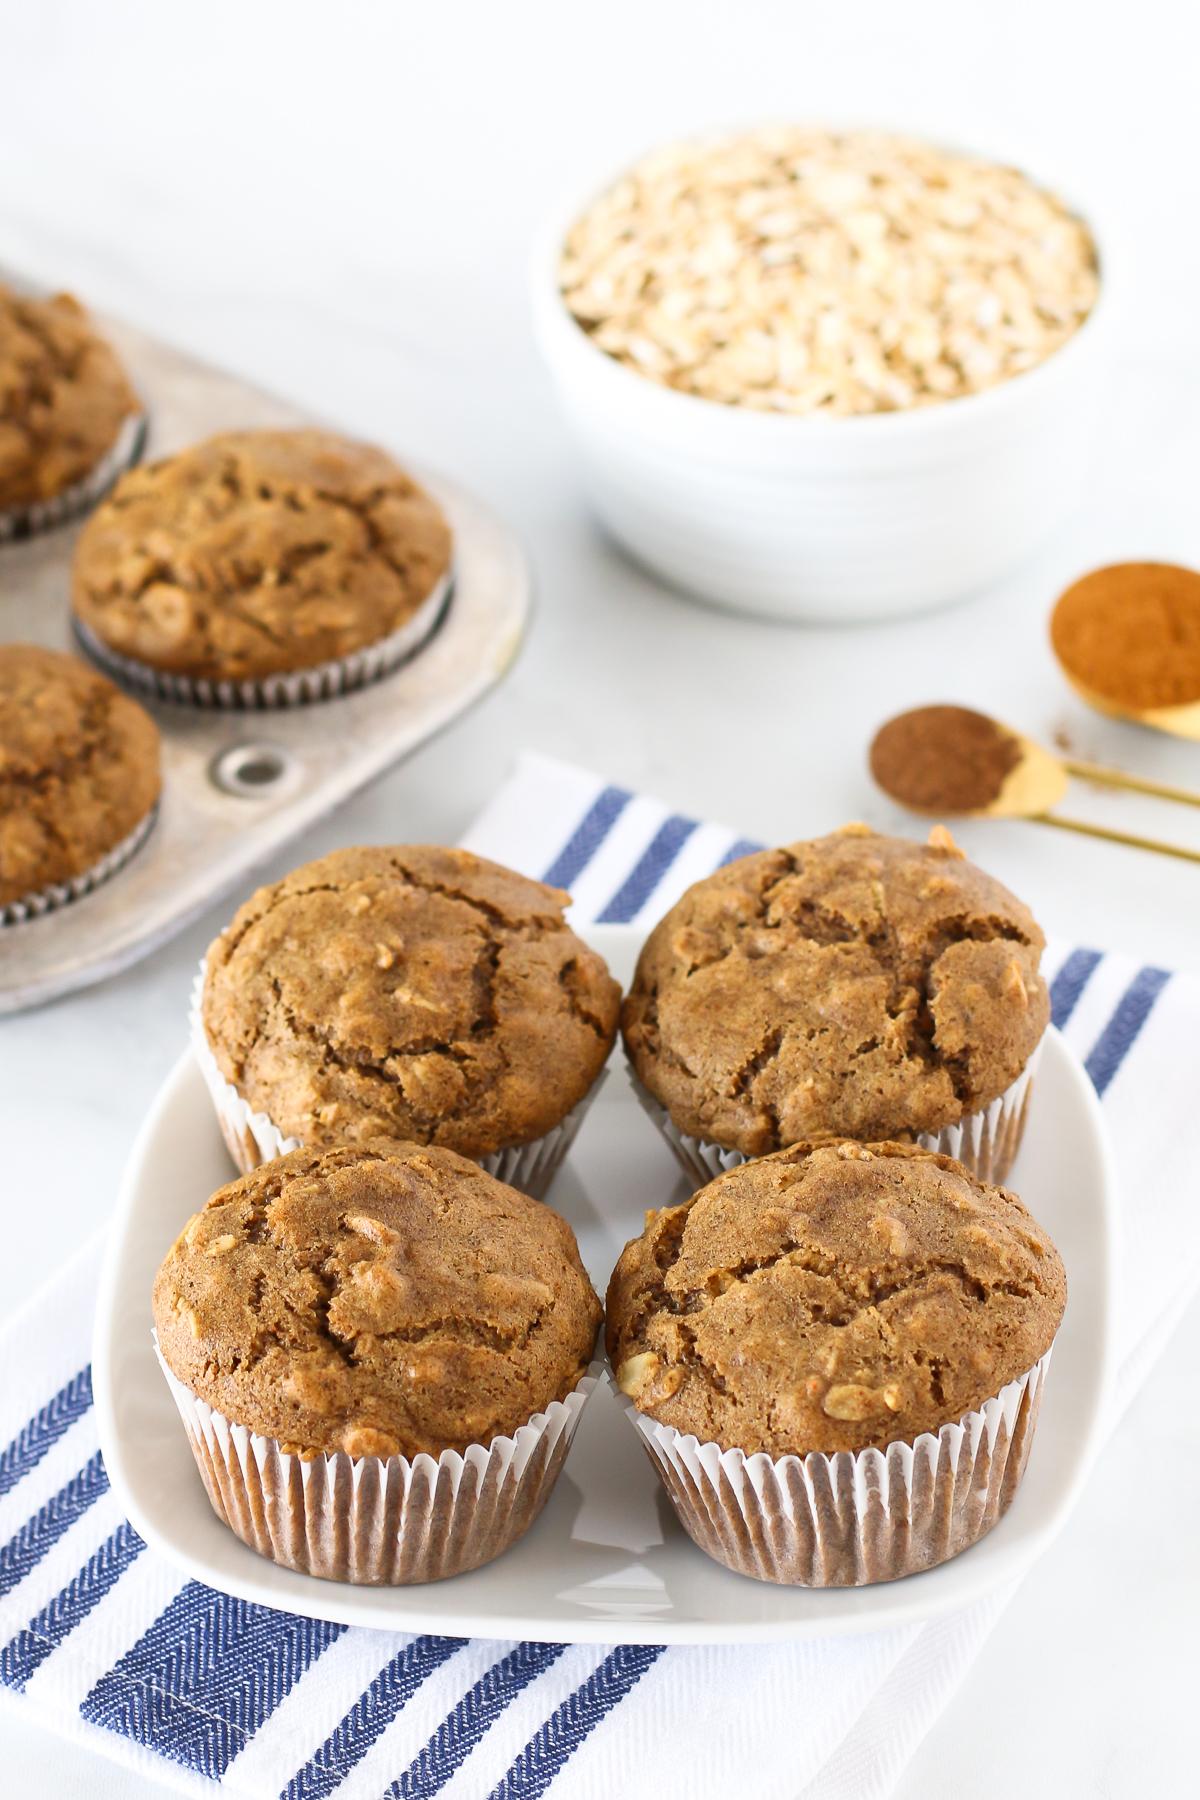 Gluten Free Vegan Oatmeal Spice Muffins